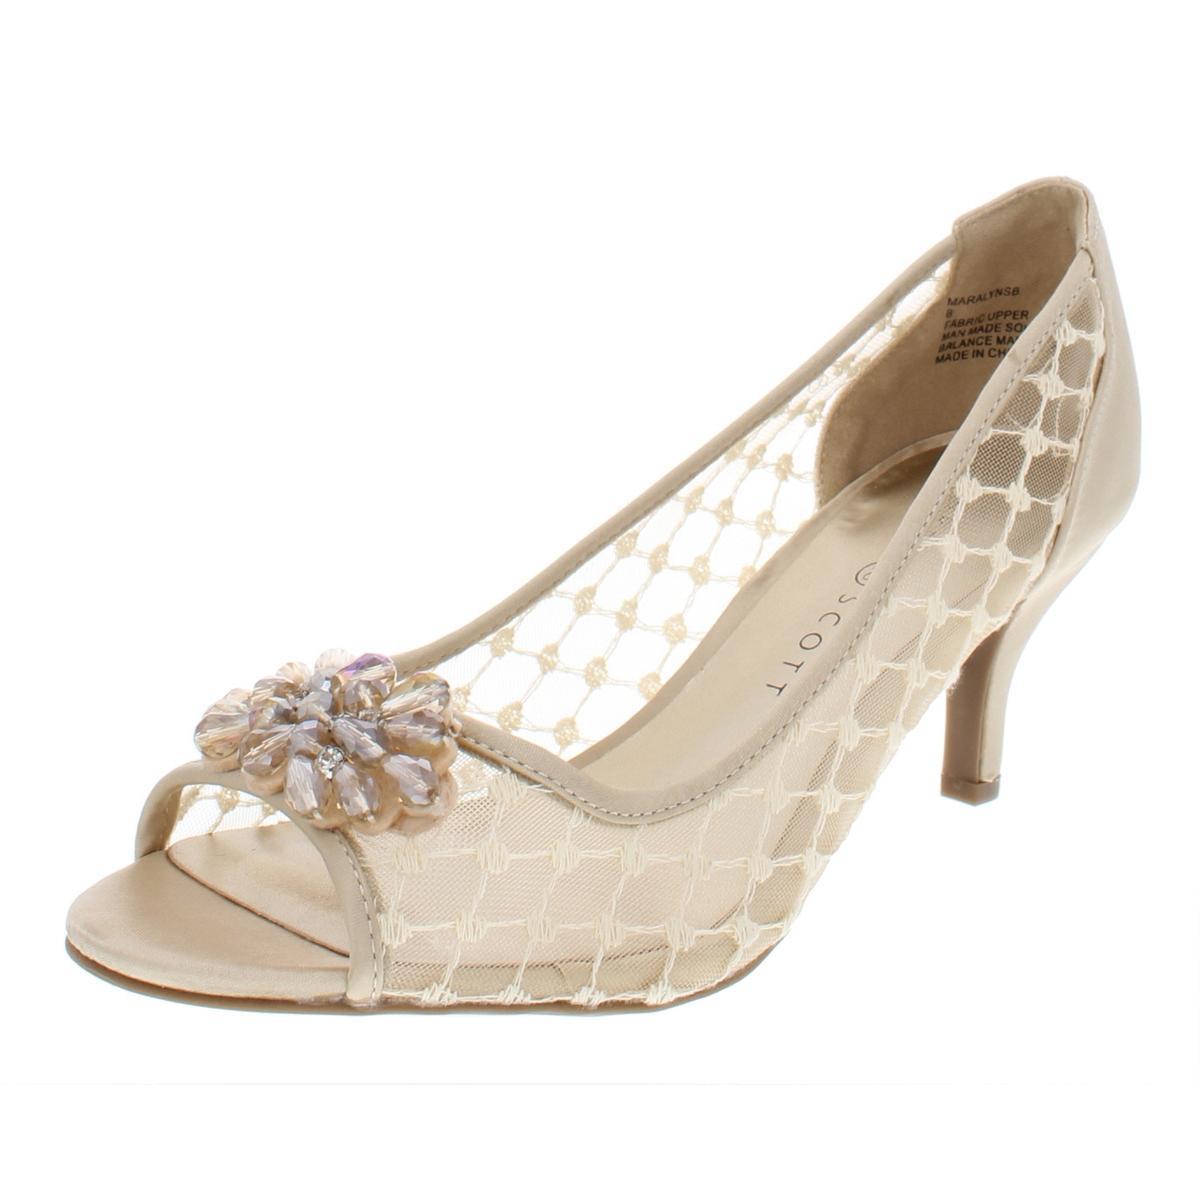 16c77bd8451 Details about Karen Scott Womens Maralyn Embellished Rhinestone Evening  Heels Shoes BHFO 7257